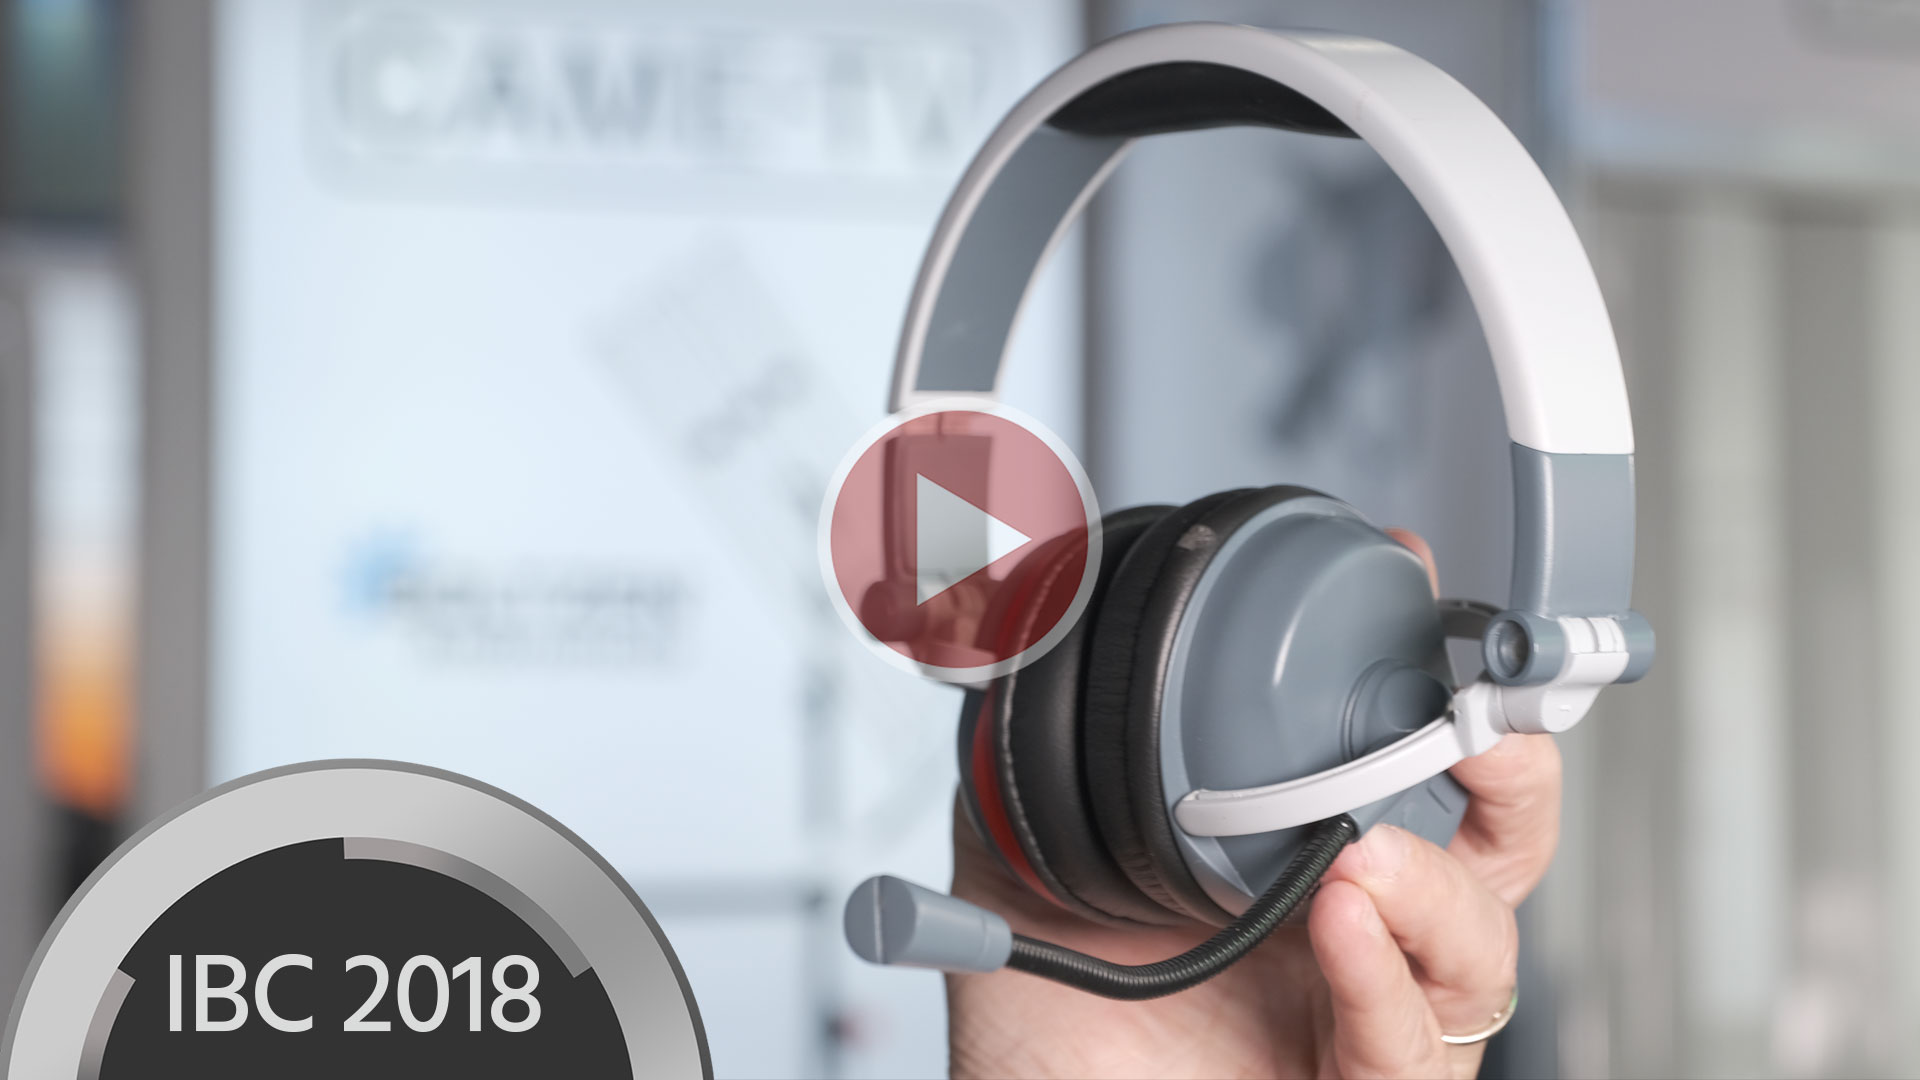 CAME-WEARO - Auriculares duplex para una comunicación perfecta de CAME-TV